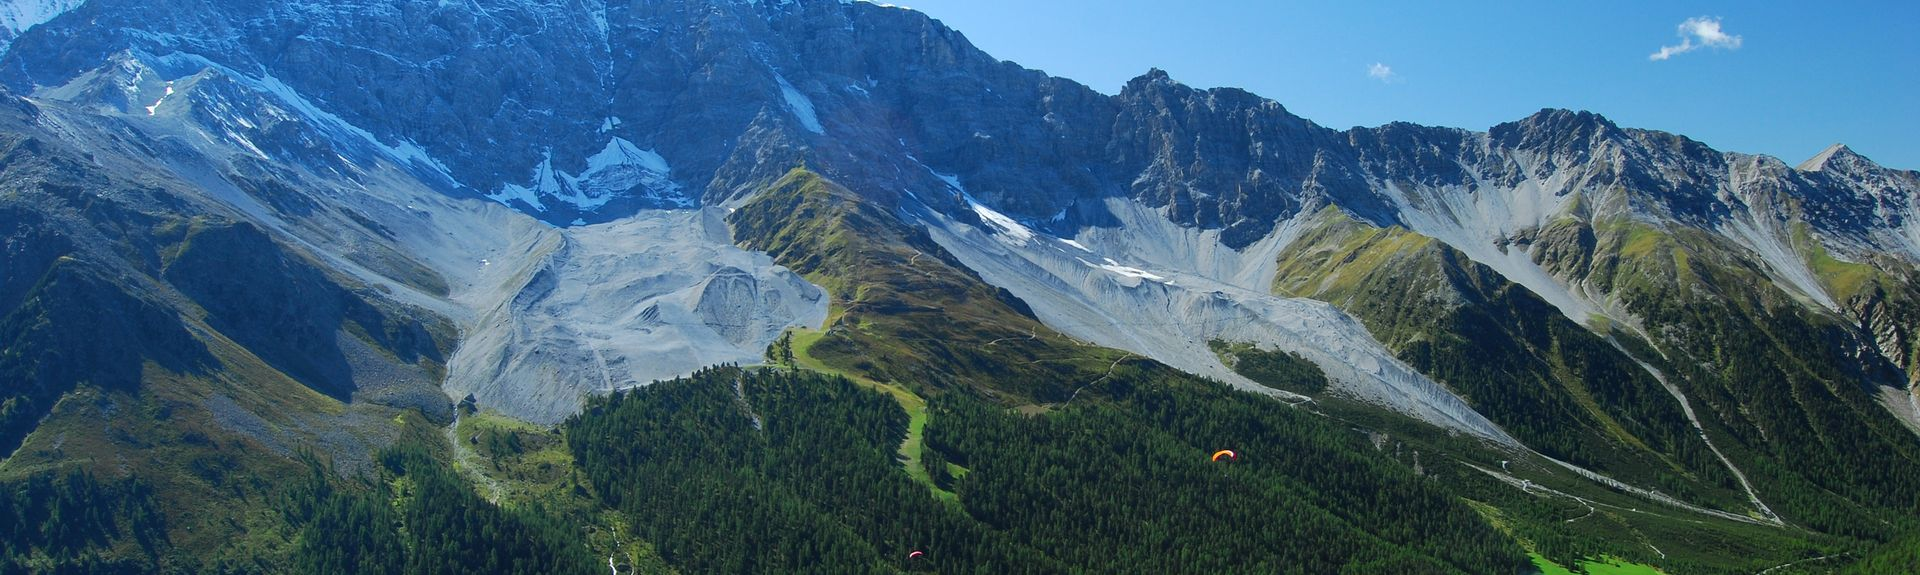 Trento Provins, Trentino-Alto Adige, Italien